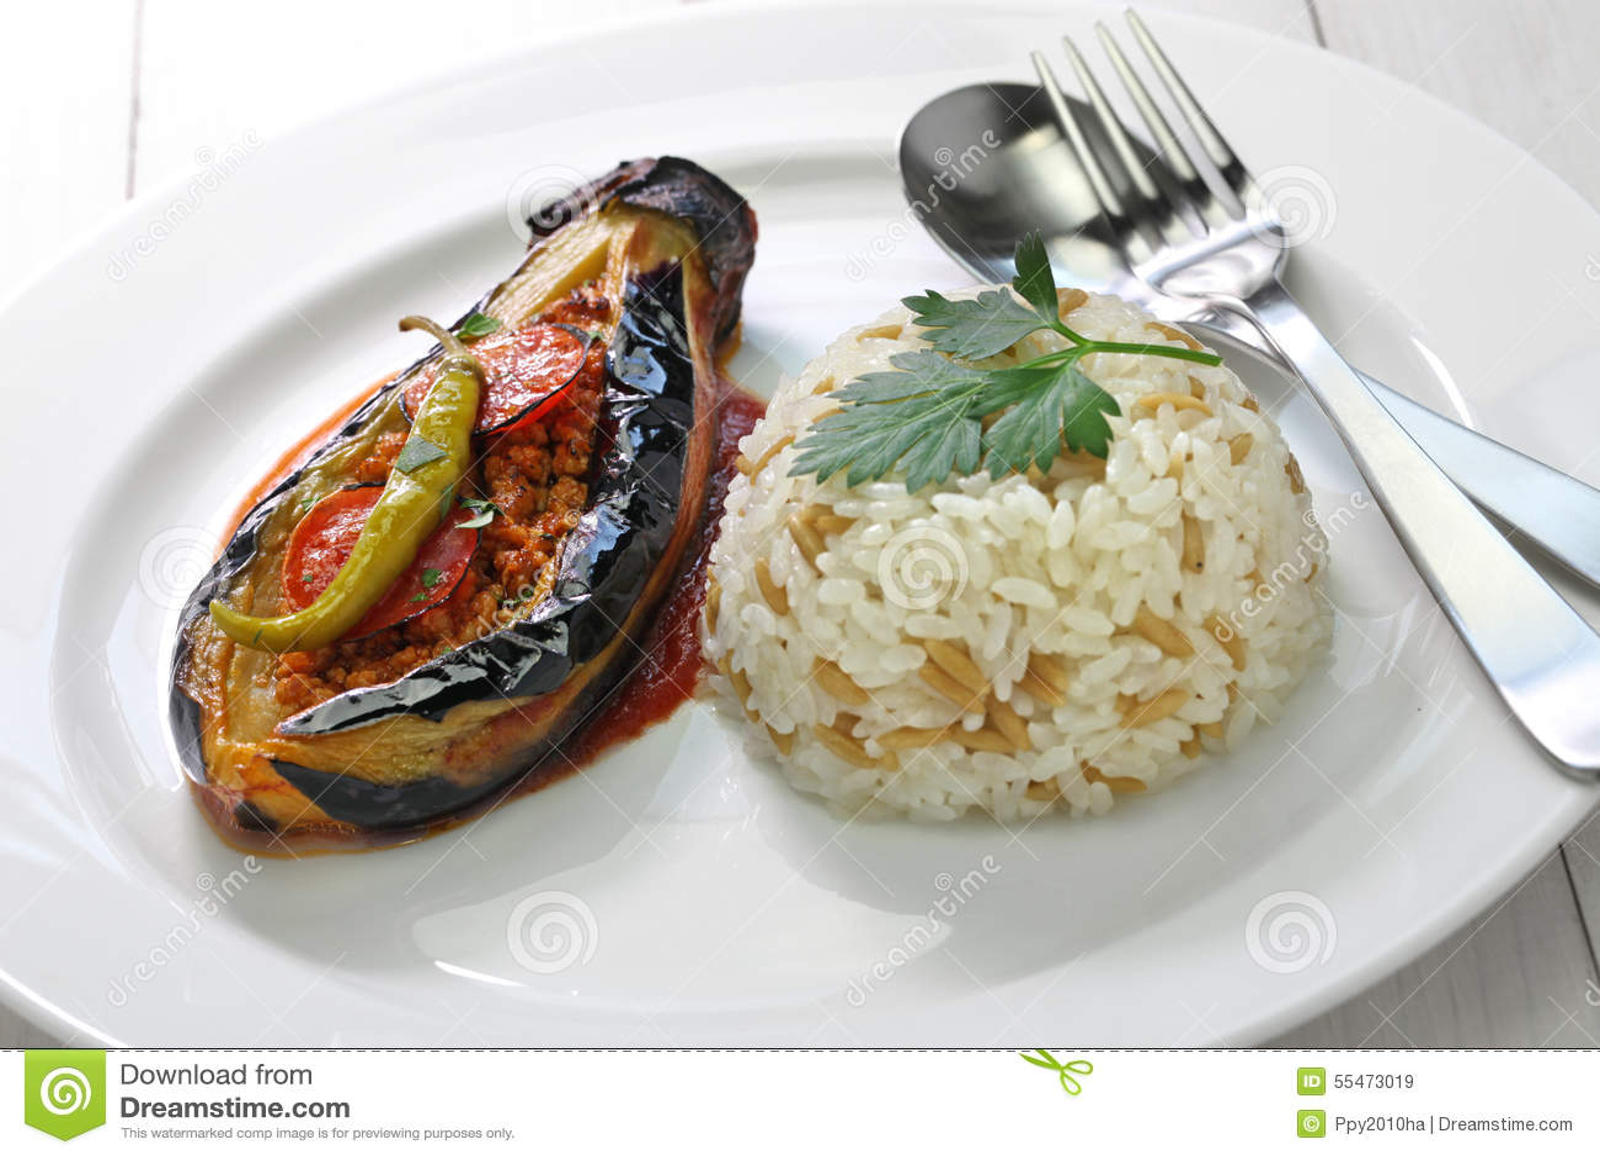 Karniyarik, Türkische Küche Stockfoto - Bild: 55473019